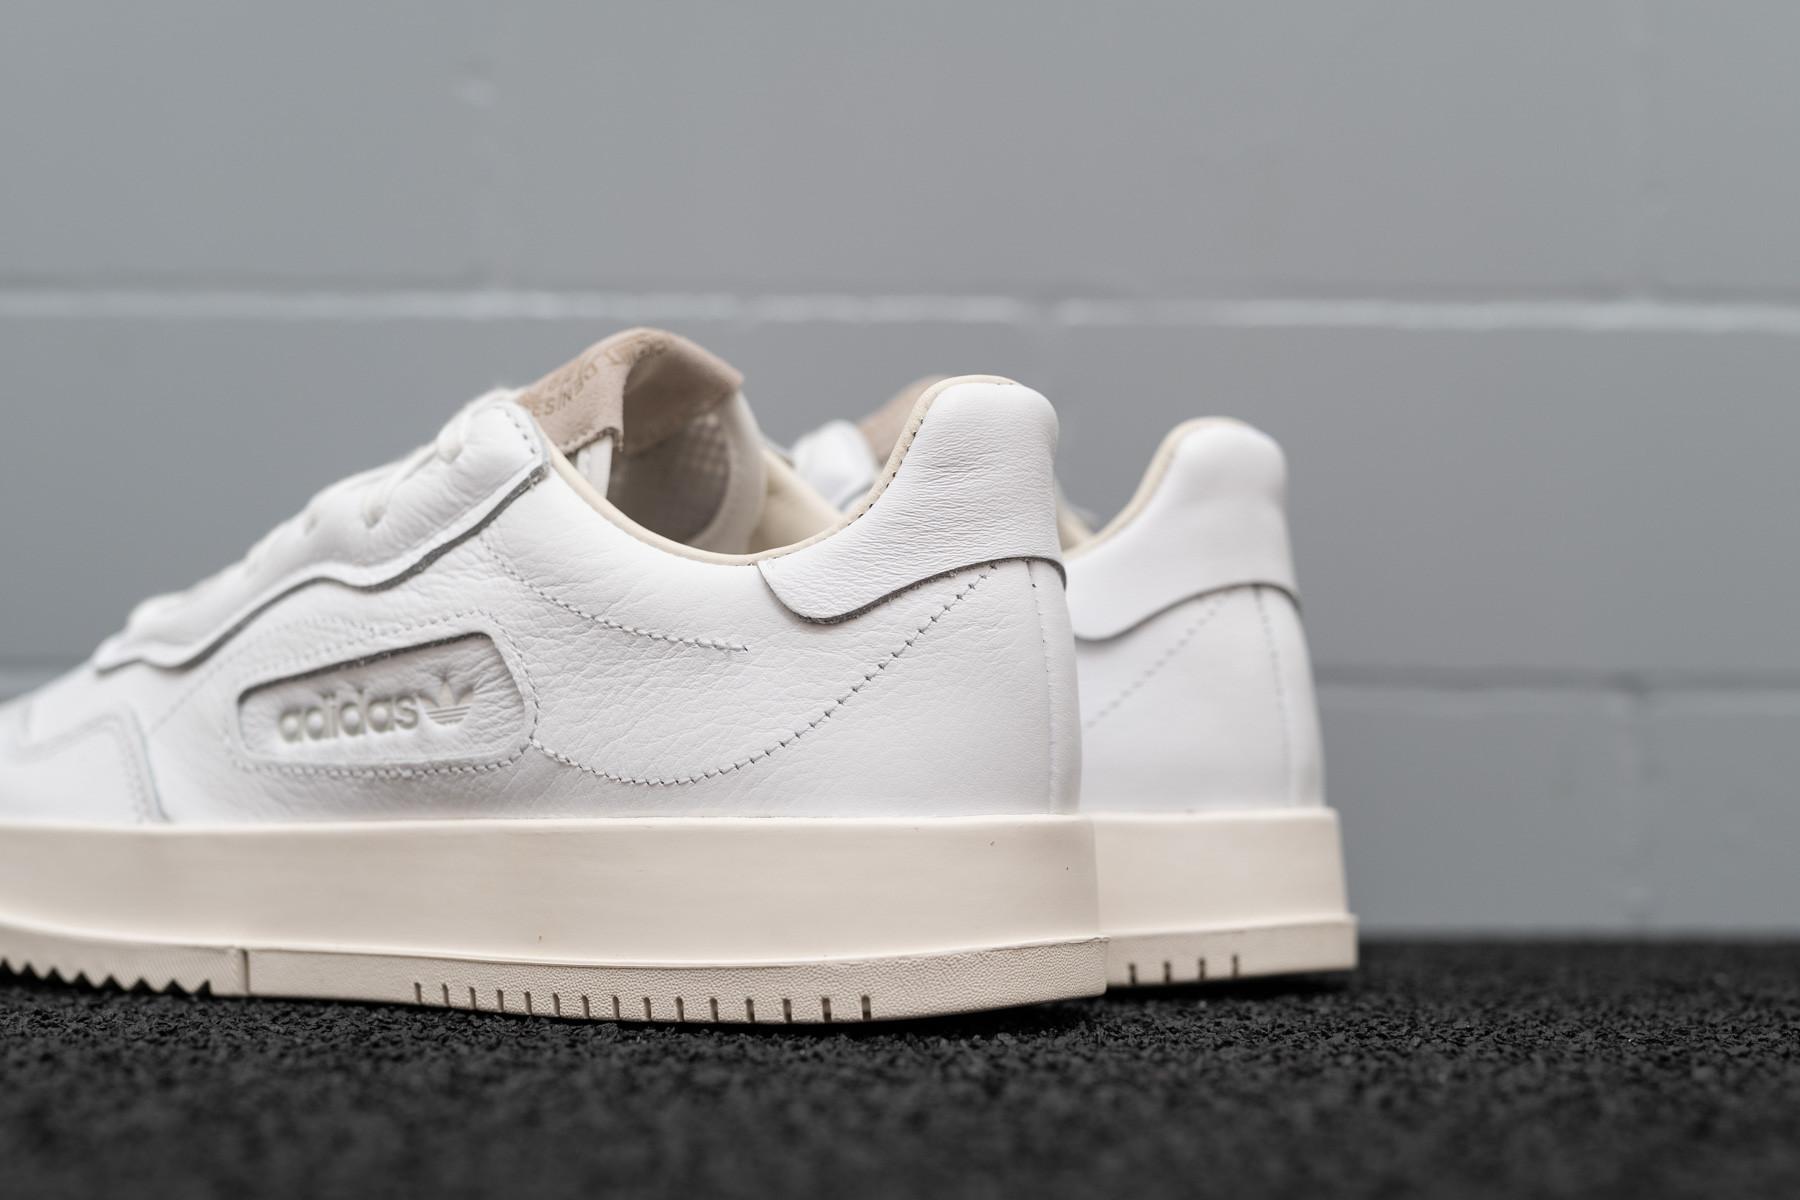 Adidas SC Premiere Sneaker.no